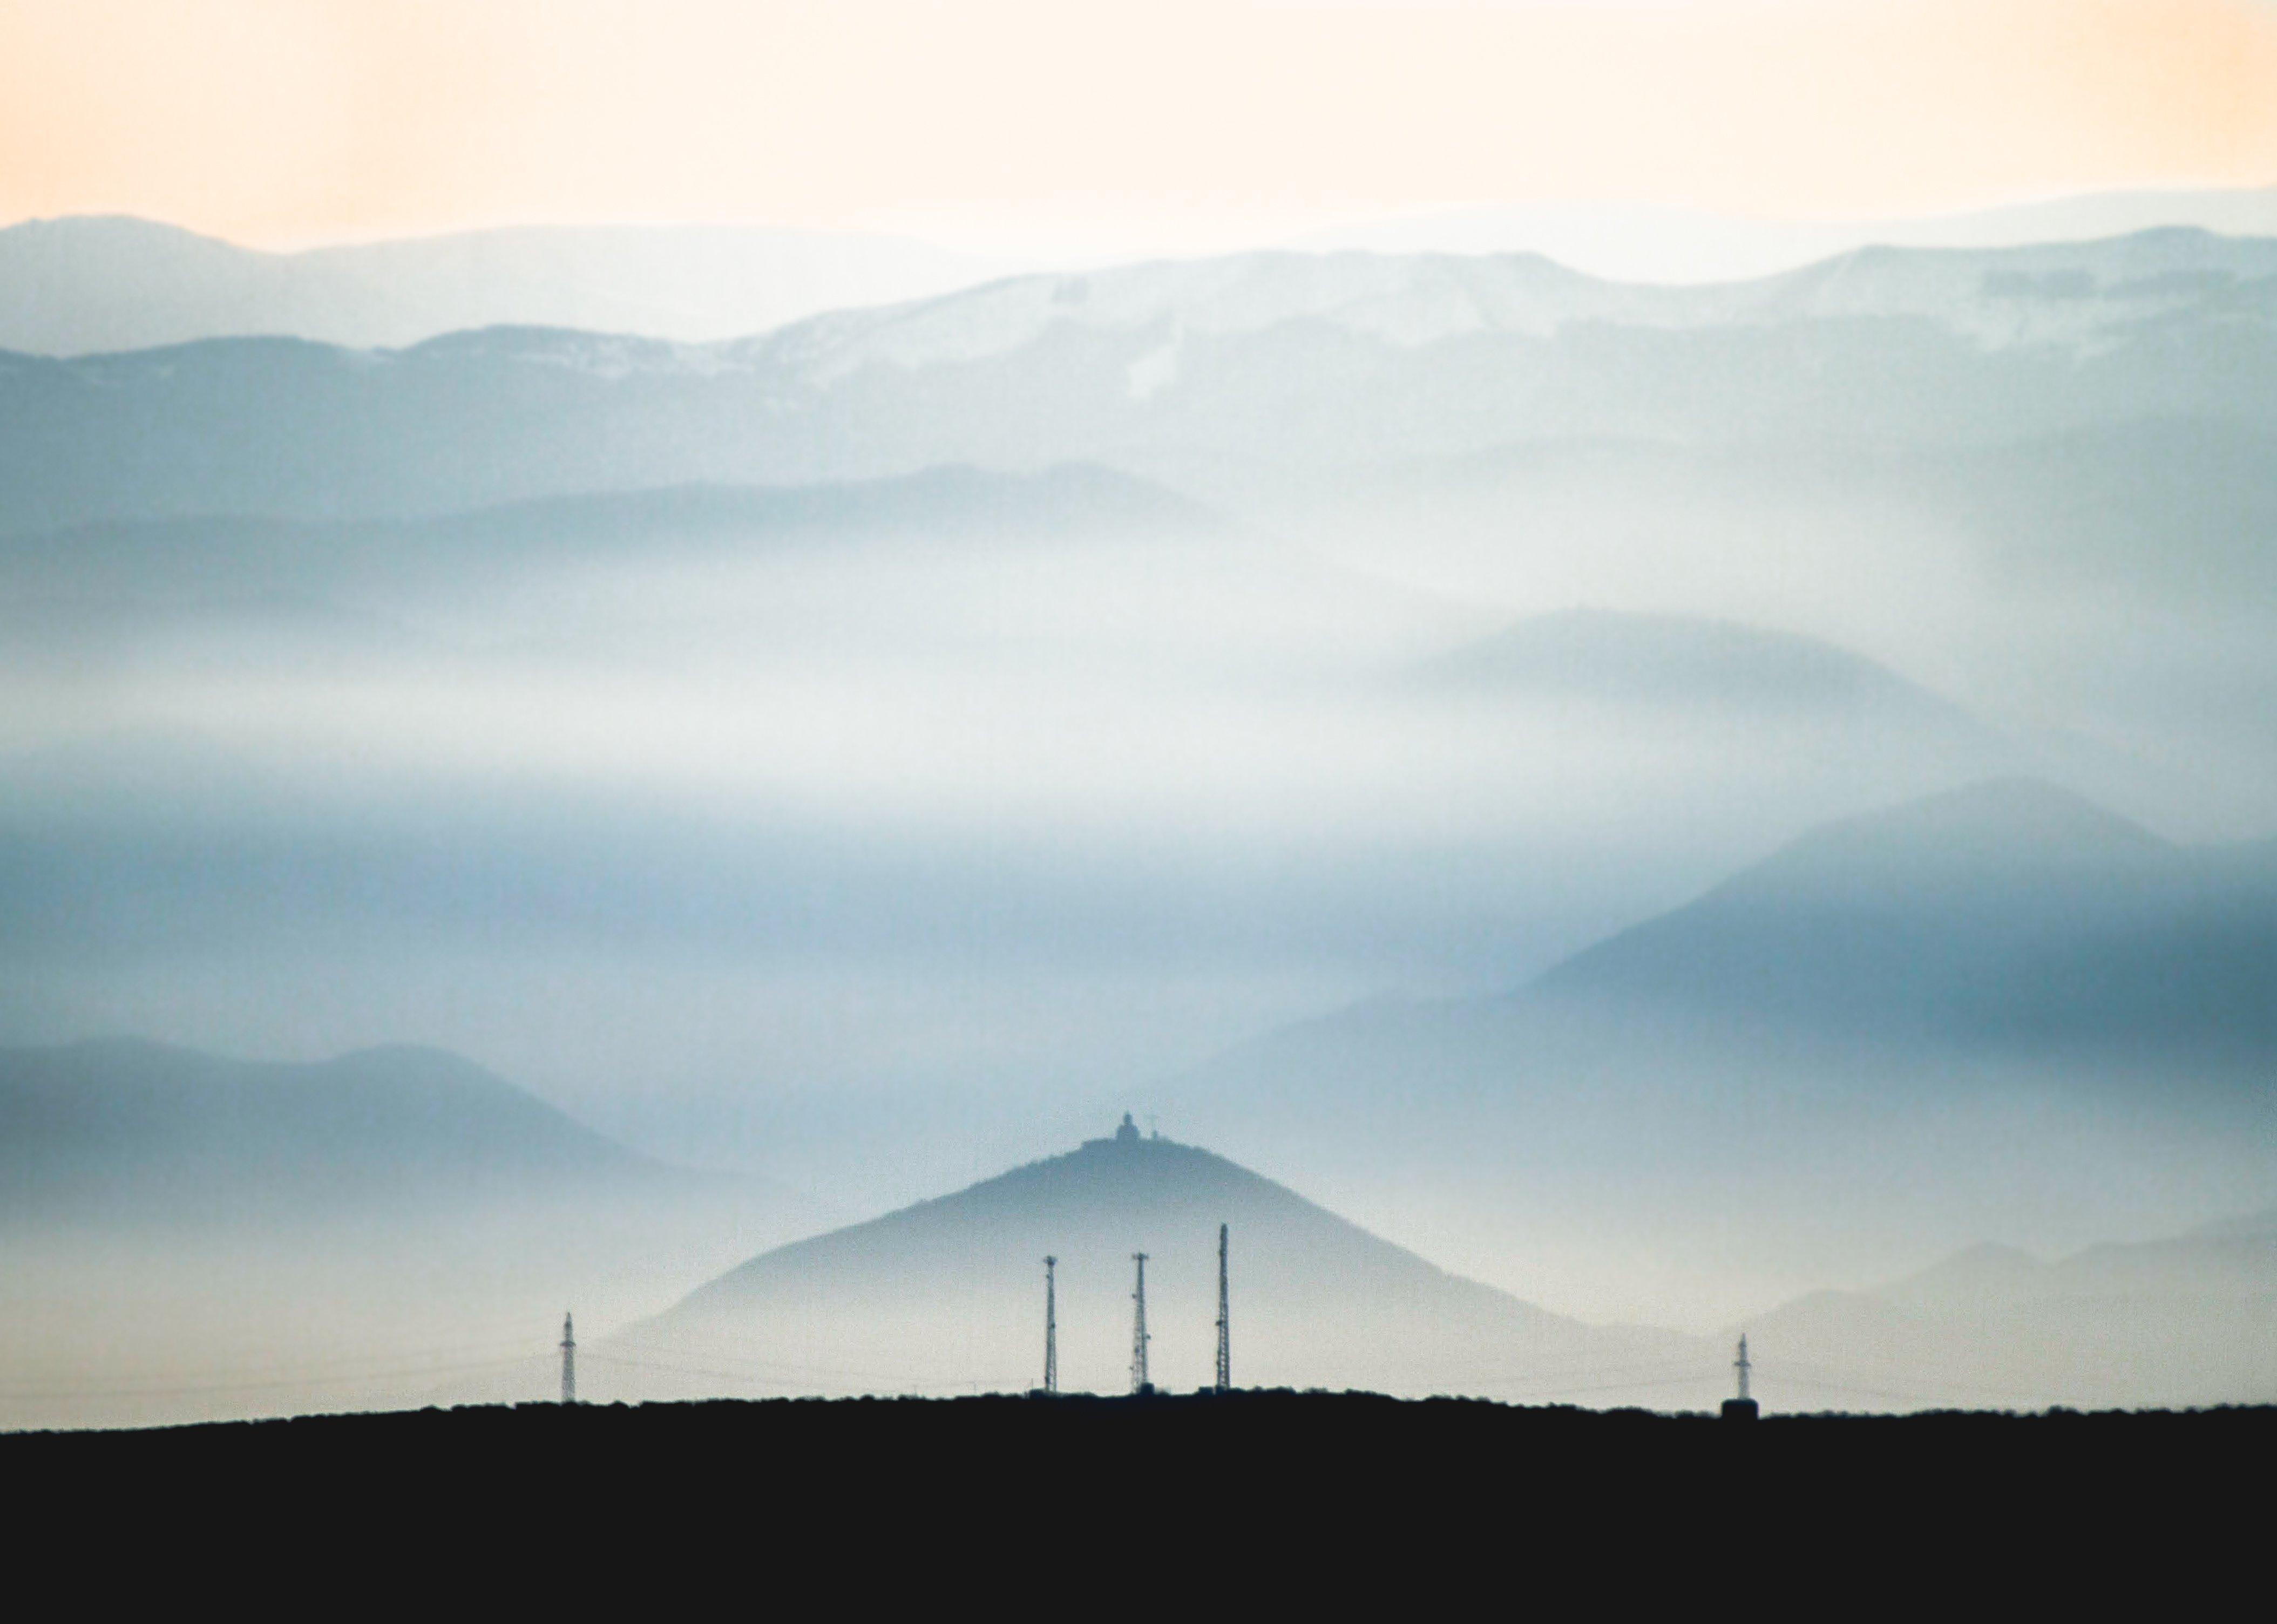 travel, mountaincs, landscape, adventure, nature, church, Da Miane